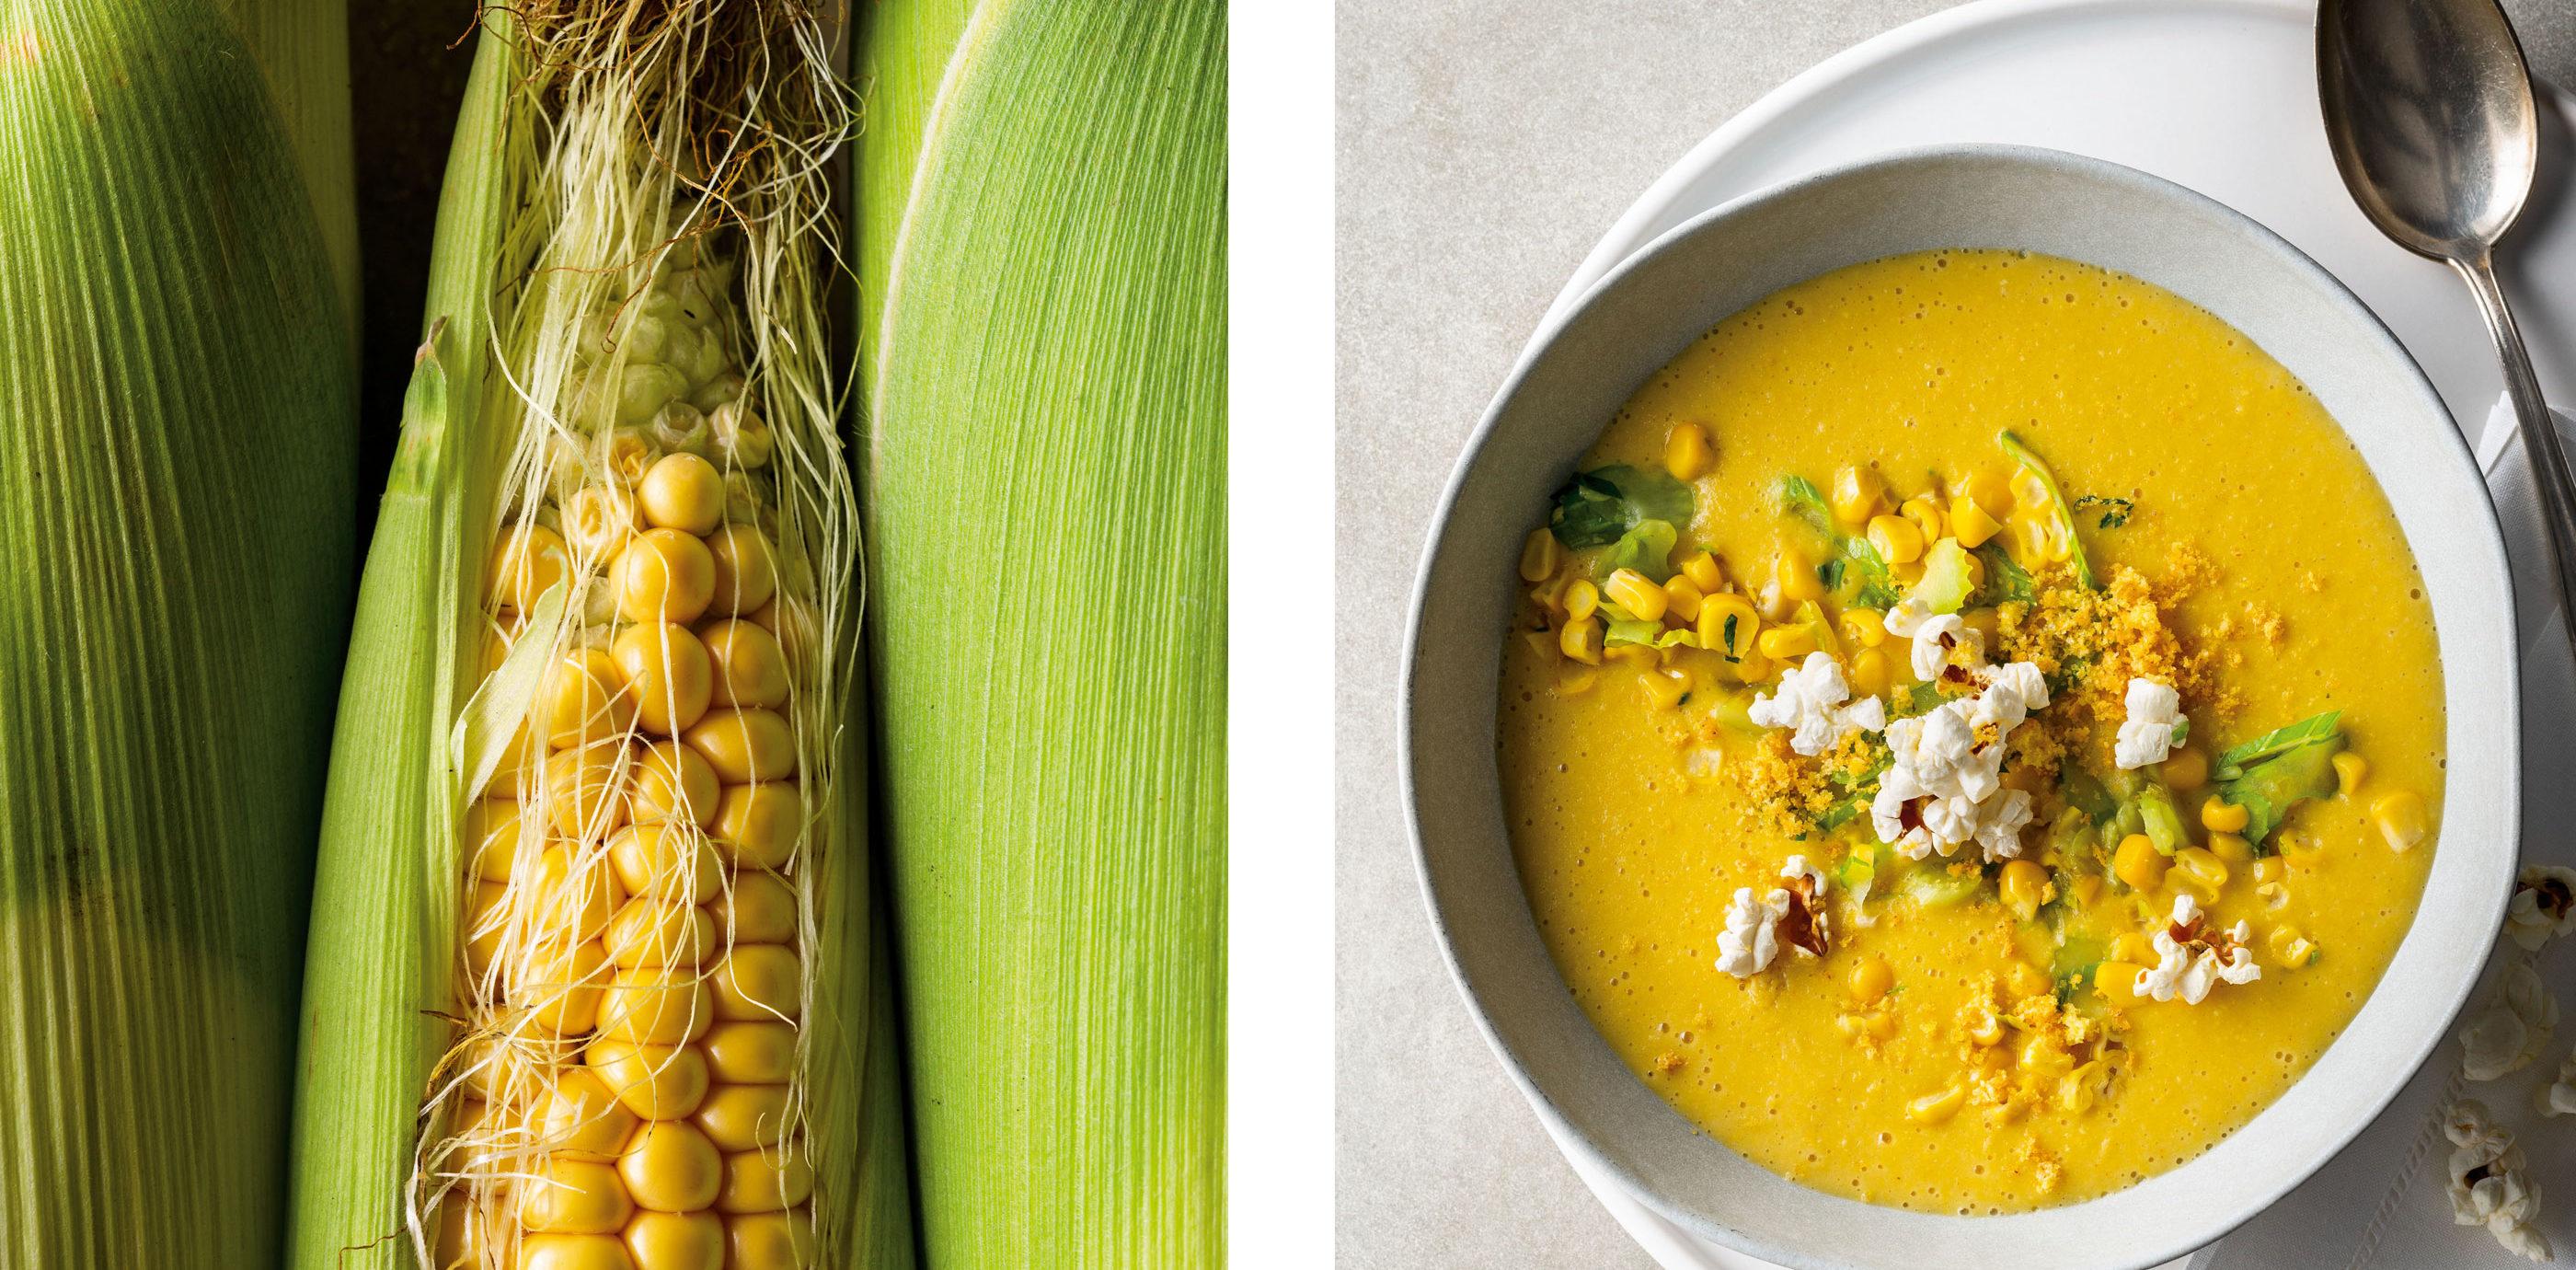 Zwei Fotos, links: goldgelbe Maiskolben, rechts: Maissuppe mit Popcorn-Topping